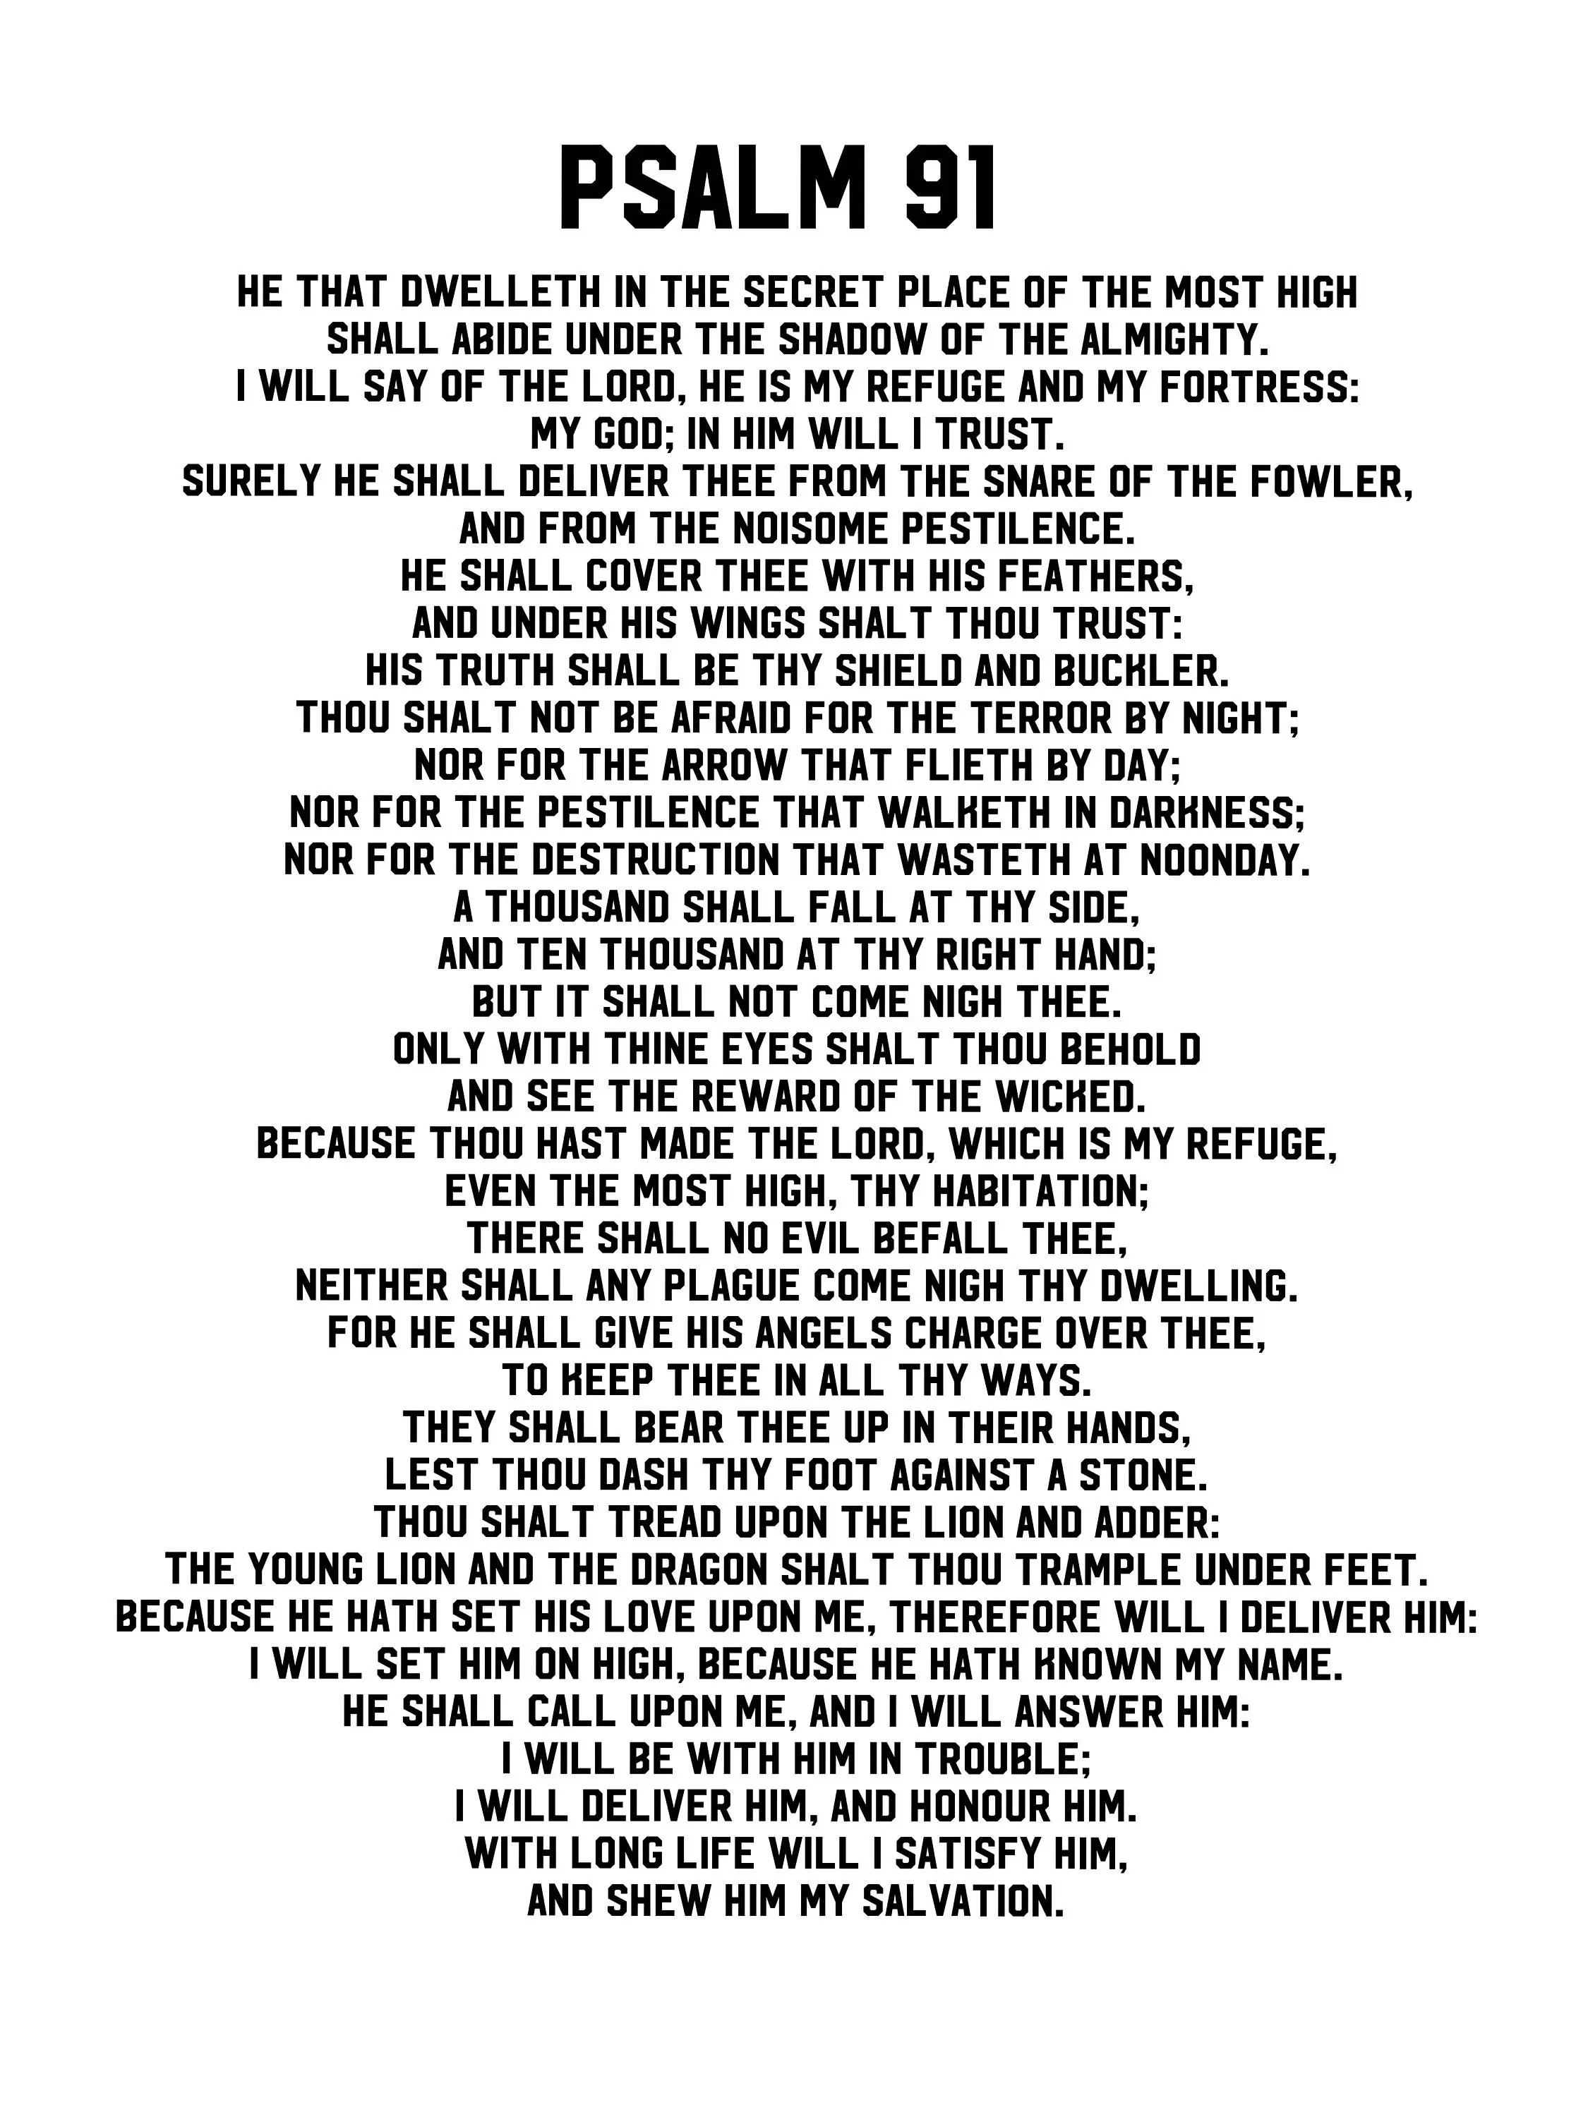 Psalm 91 Poster. Printable PDF gift psalm 91 prayer Card